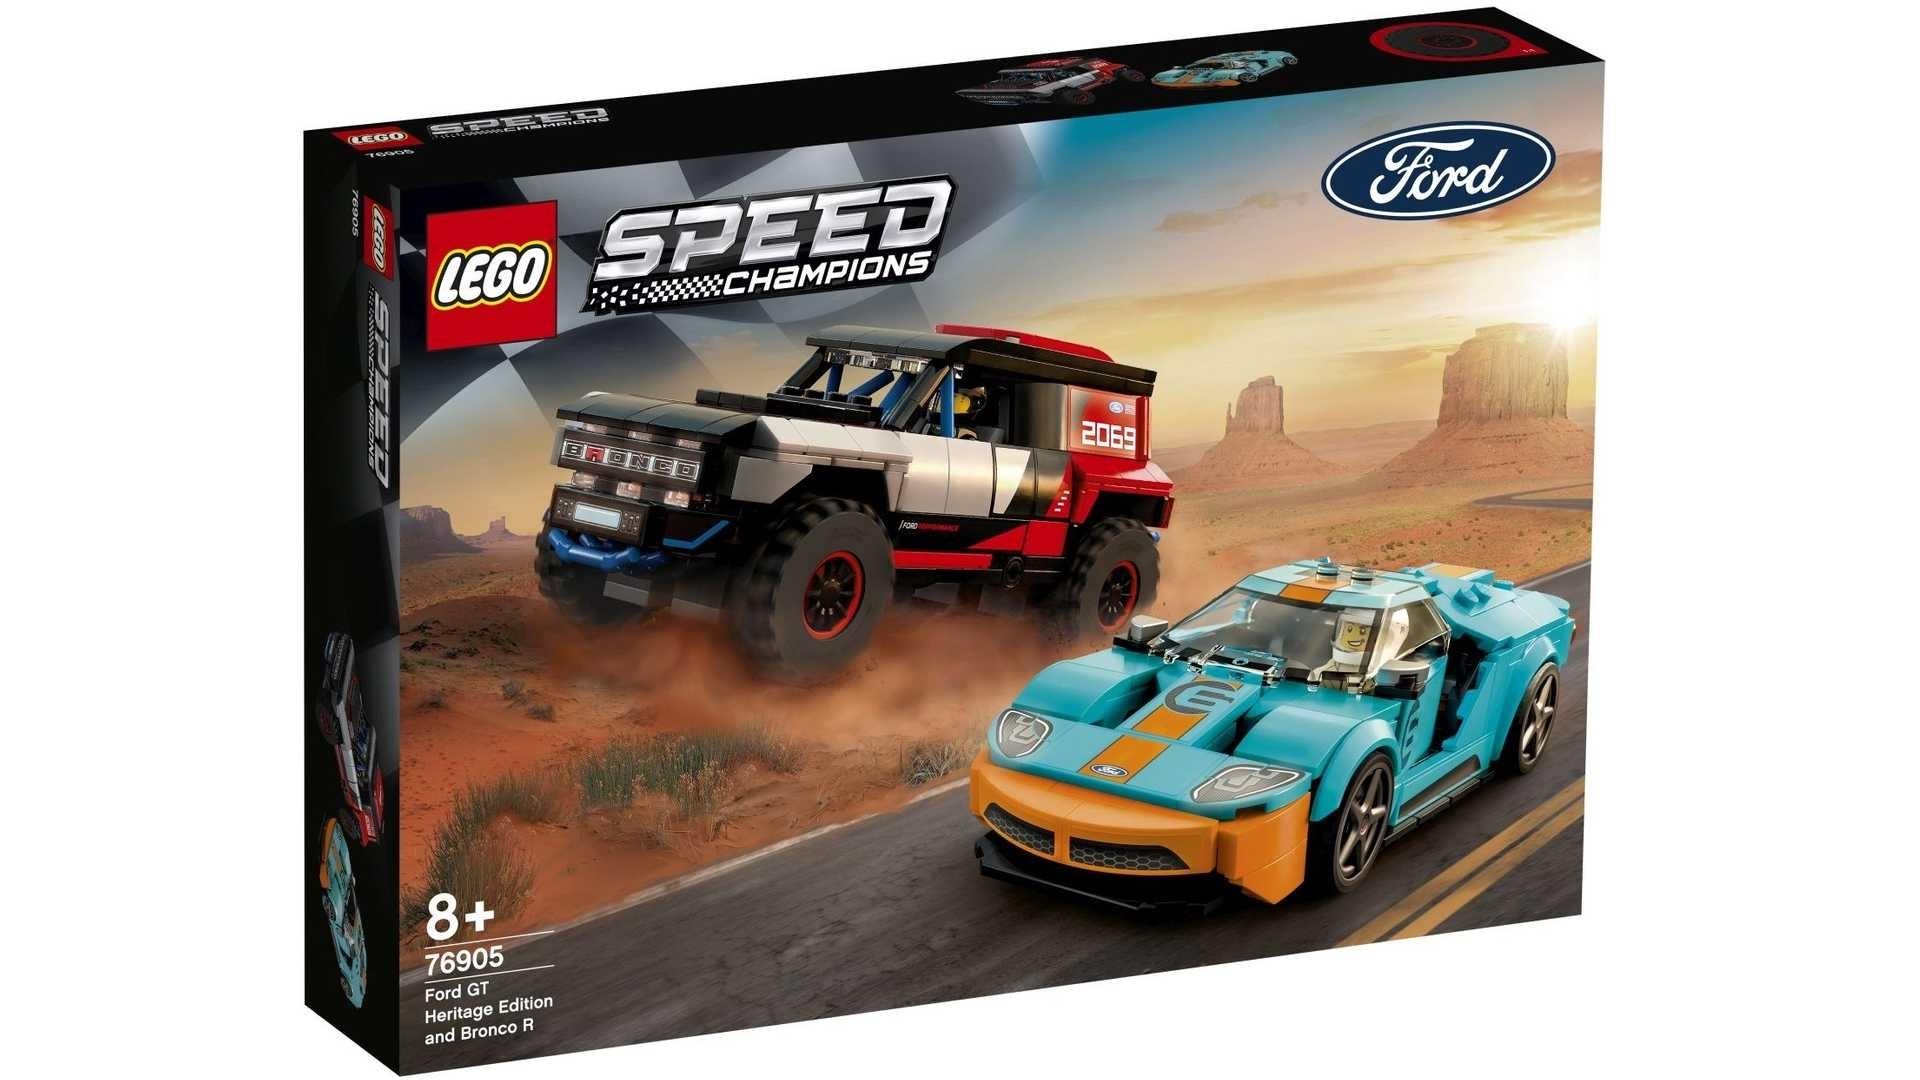 Lego Speed Champions Novedades 2021 0521 004